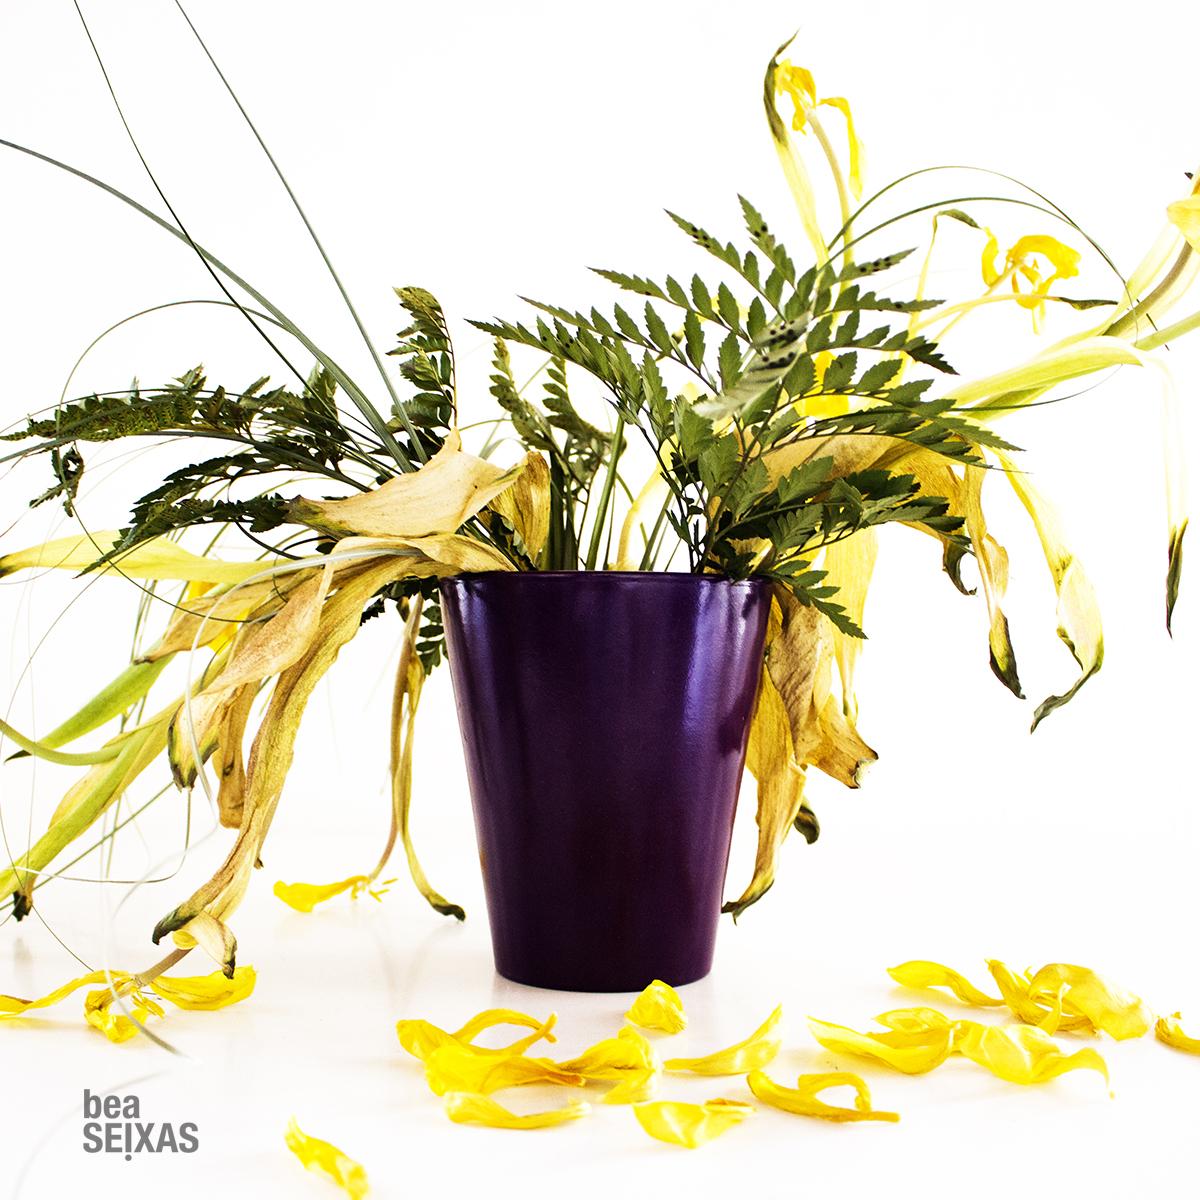 Fotografía de planta con luz natural realizada por Bea López Seijas, fotógrafa gallega en Barcelona.